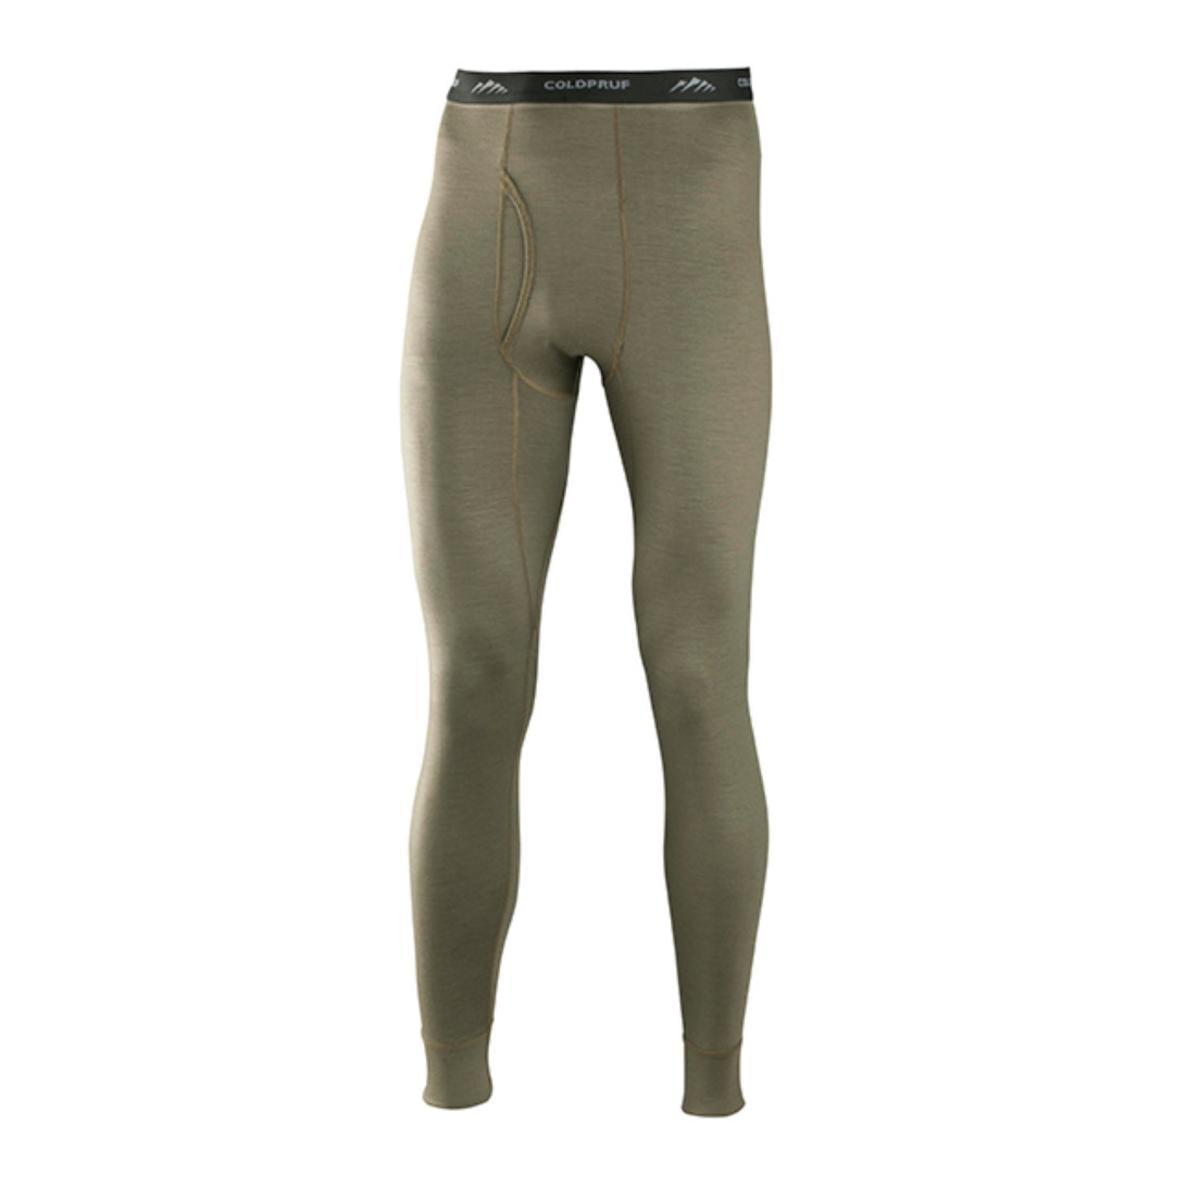 inderamills Coldpruf Classic Series Merino Wool Thermal U...